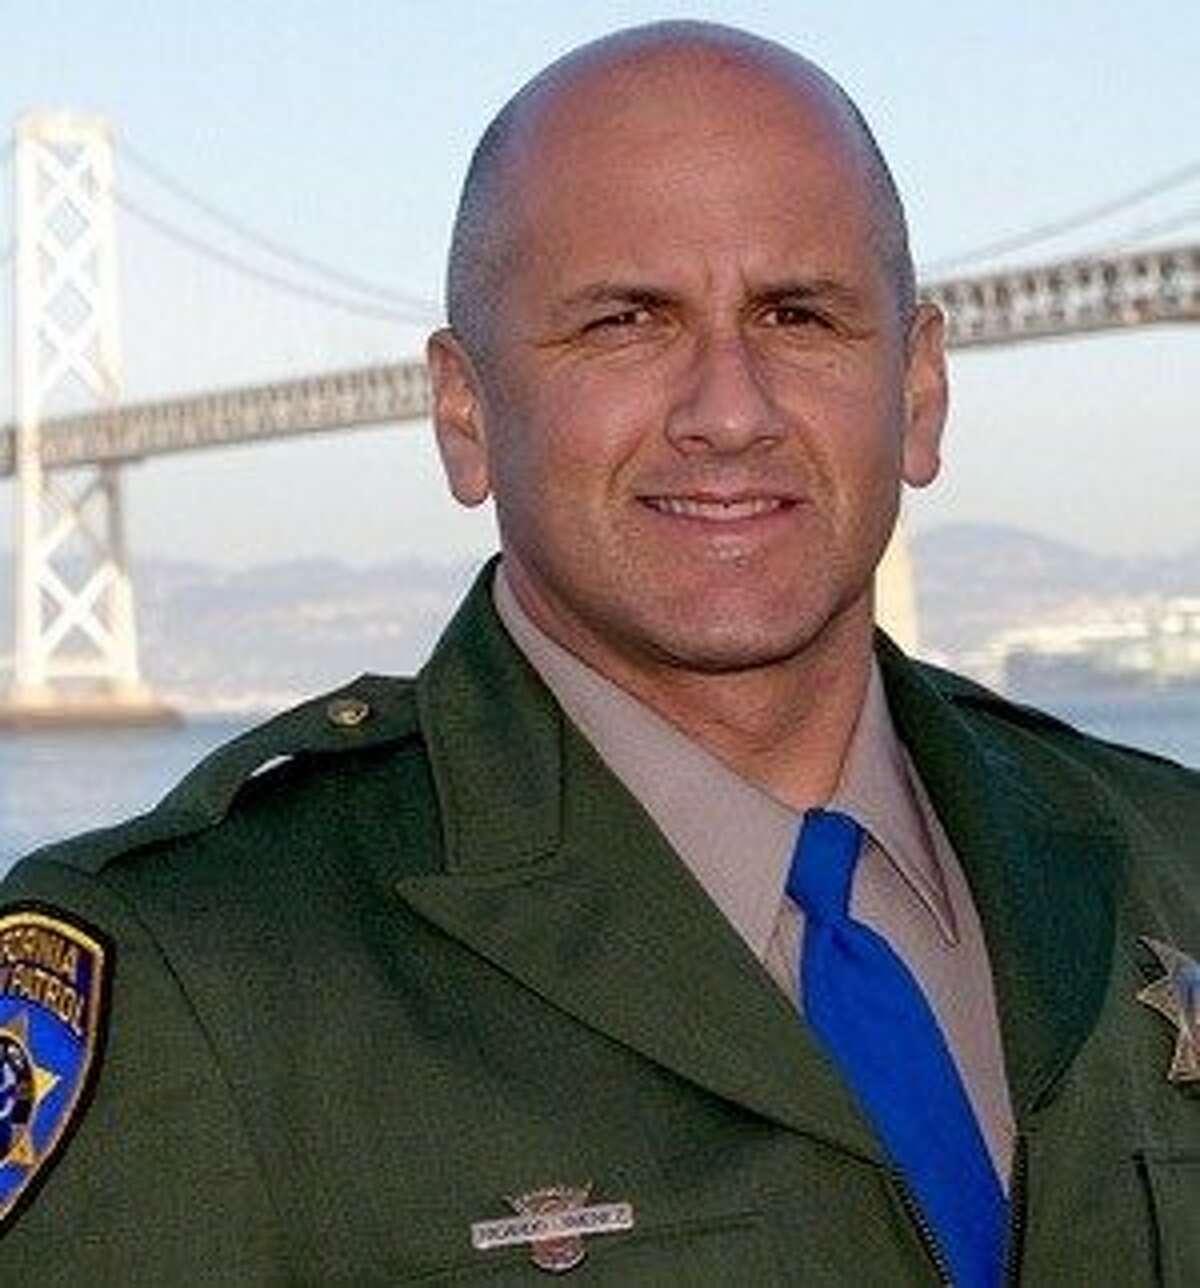 California Highway Patrol Officer Ricardo Jimenez